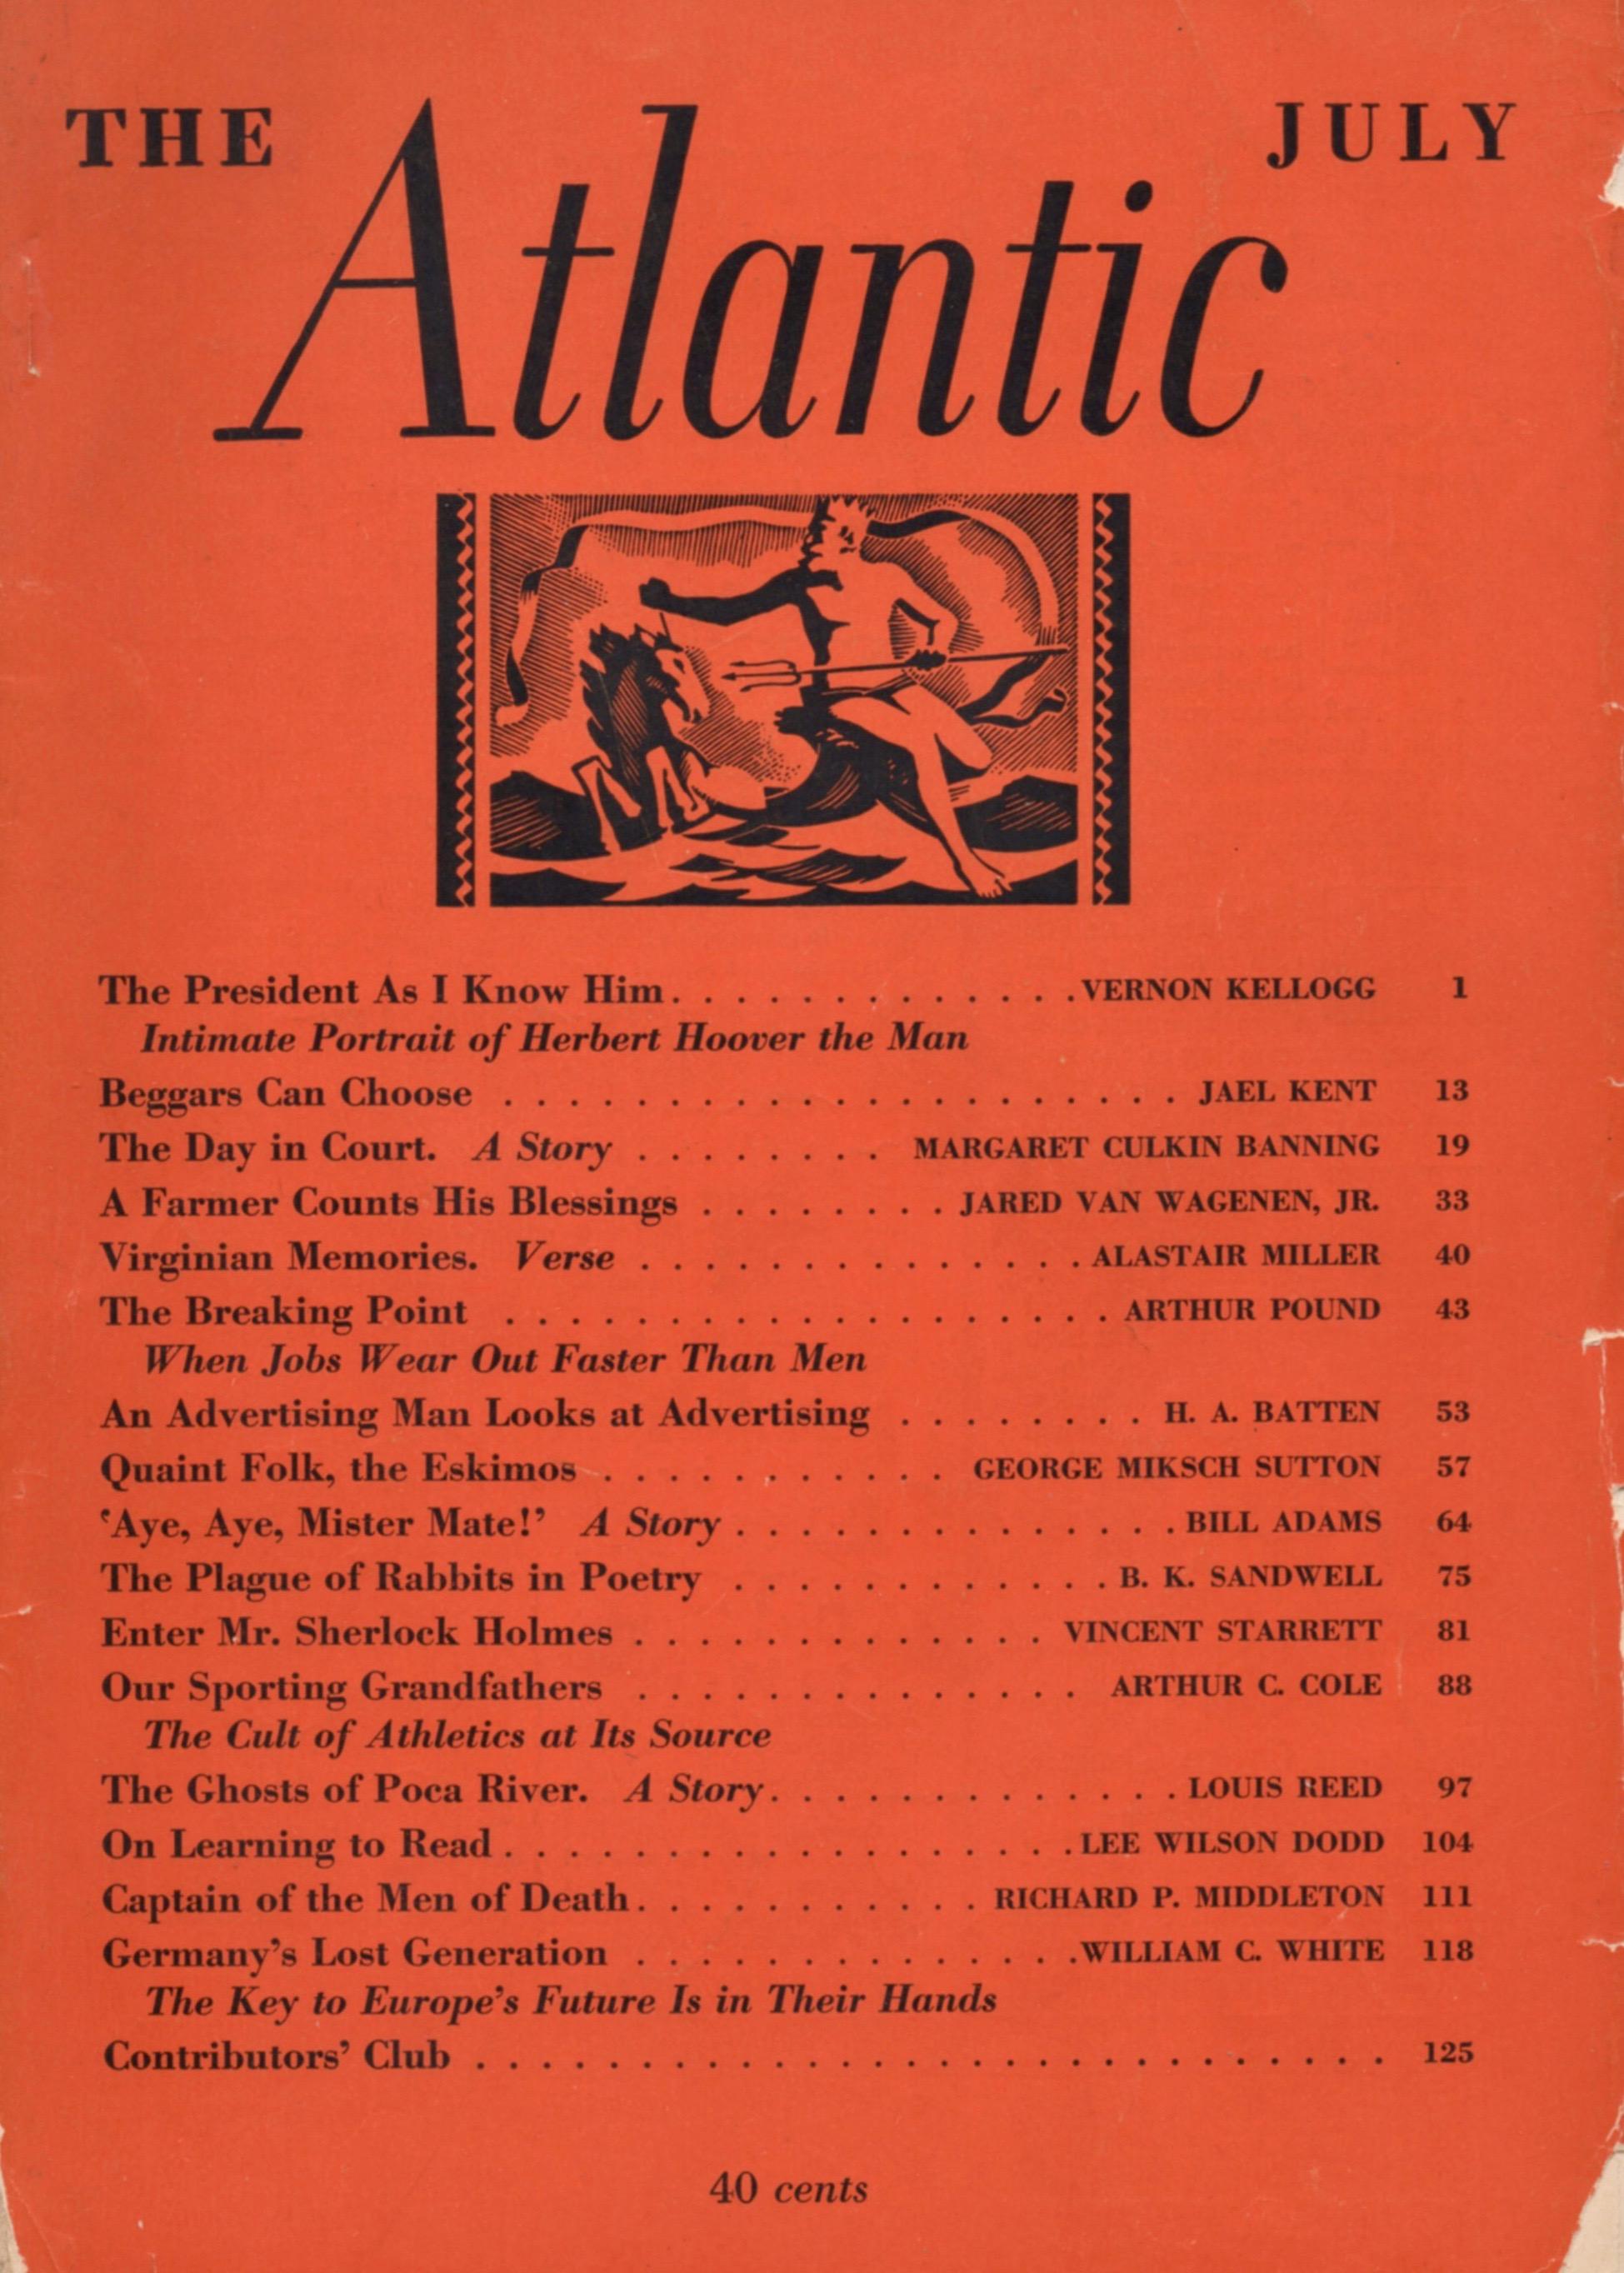 Atlantic July 1932 cover.jpg